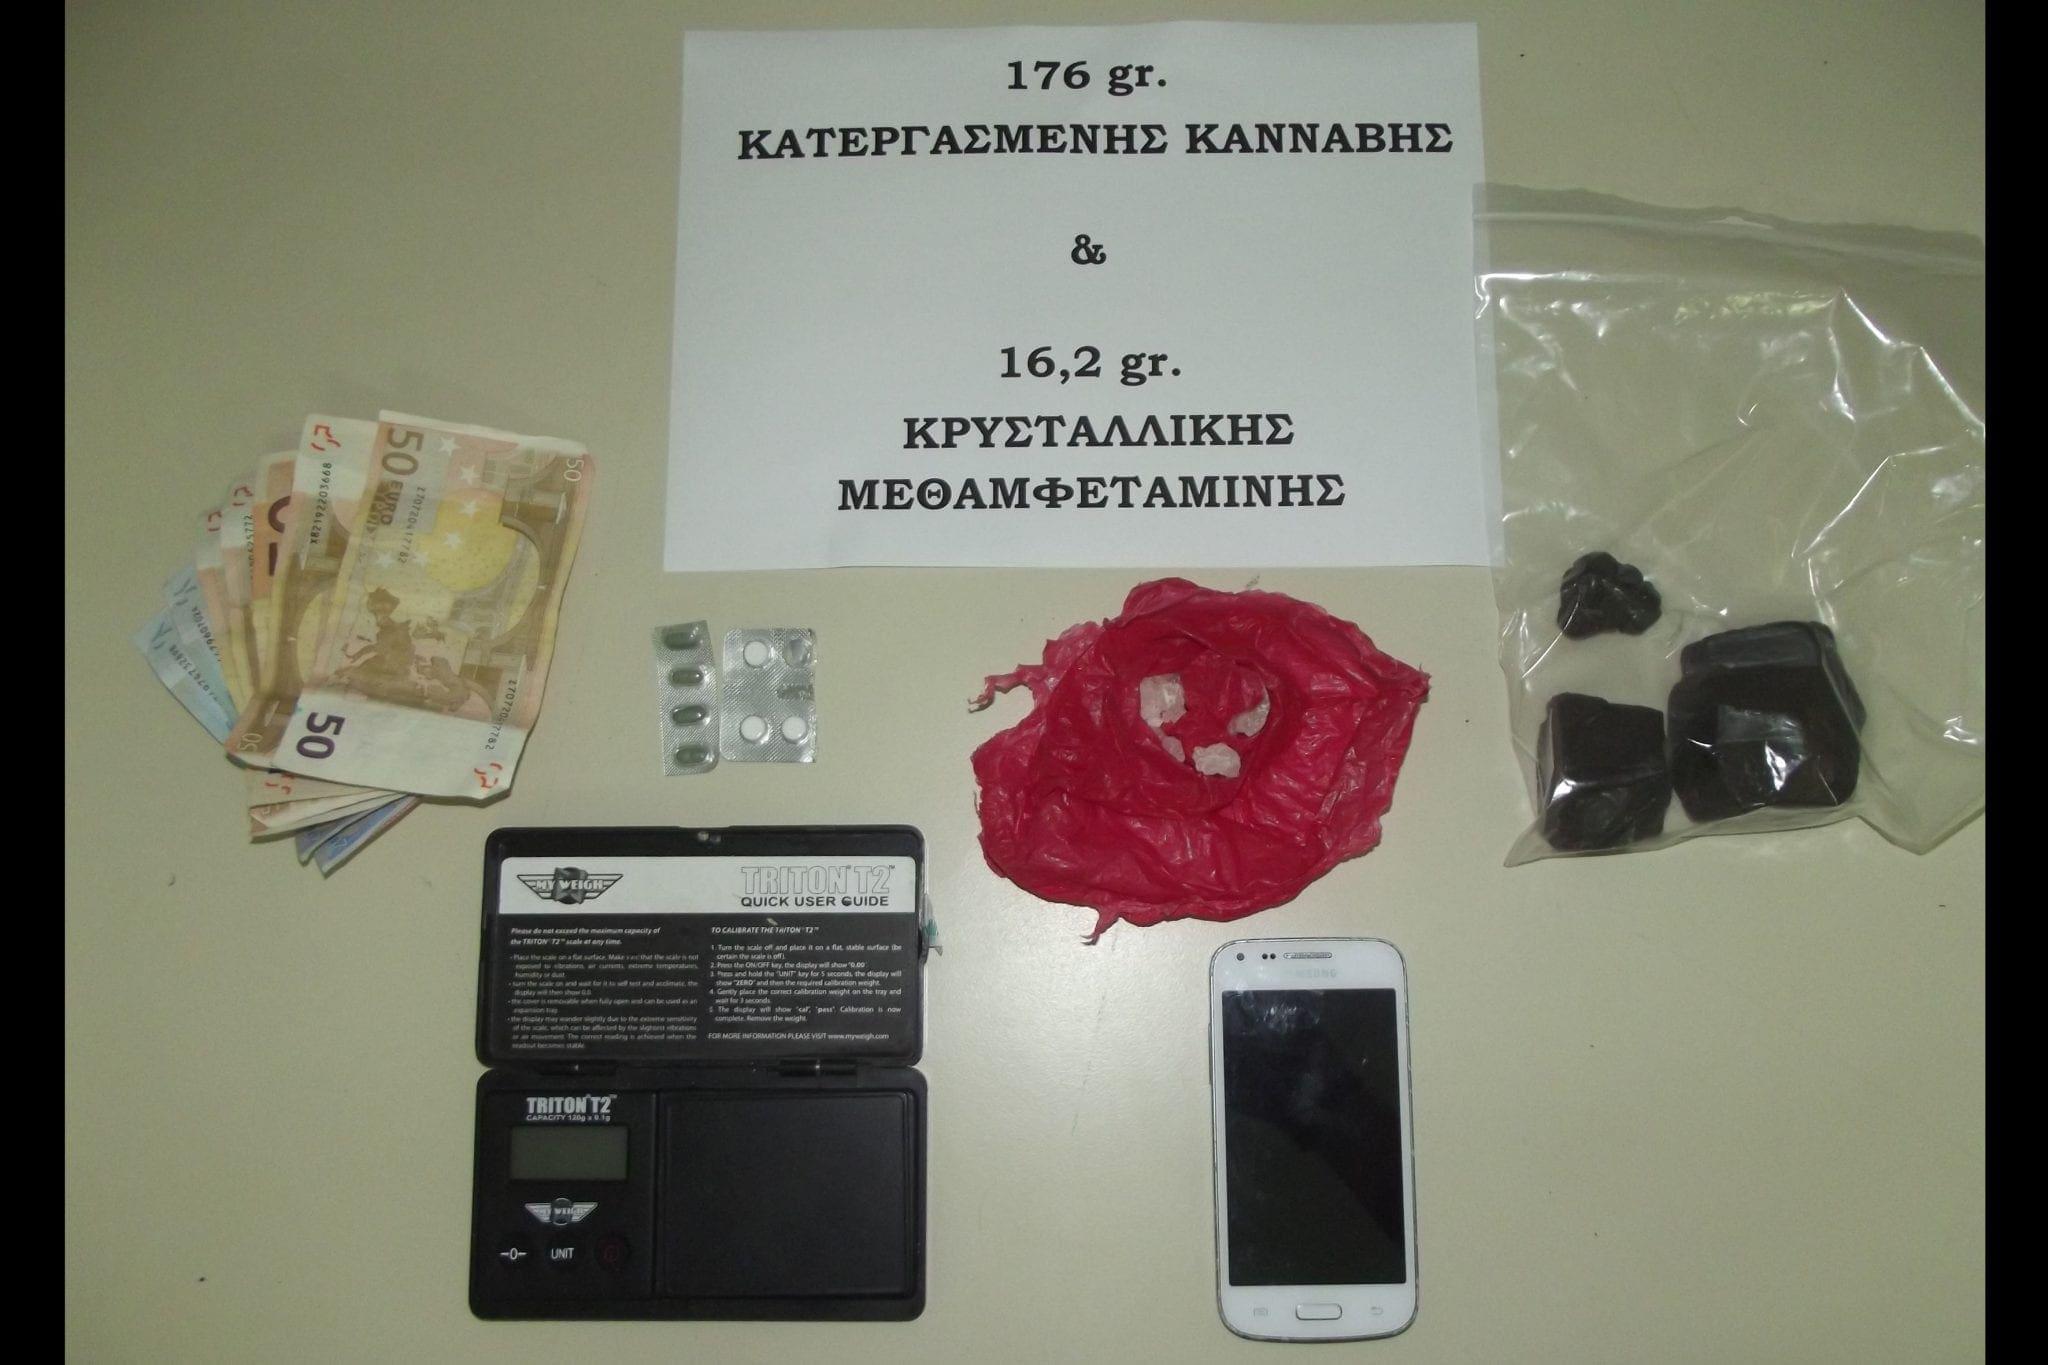 DT-NARKOTIKA KANNABH AMFETAMINH RODOS